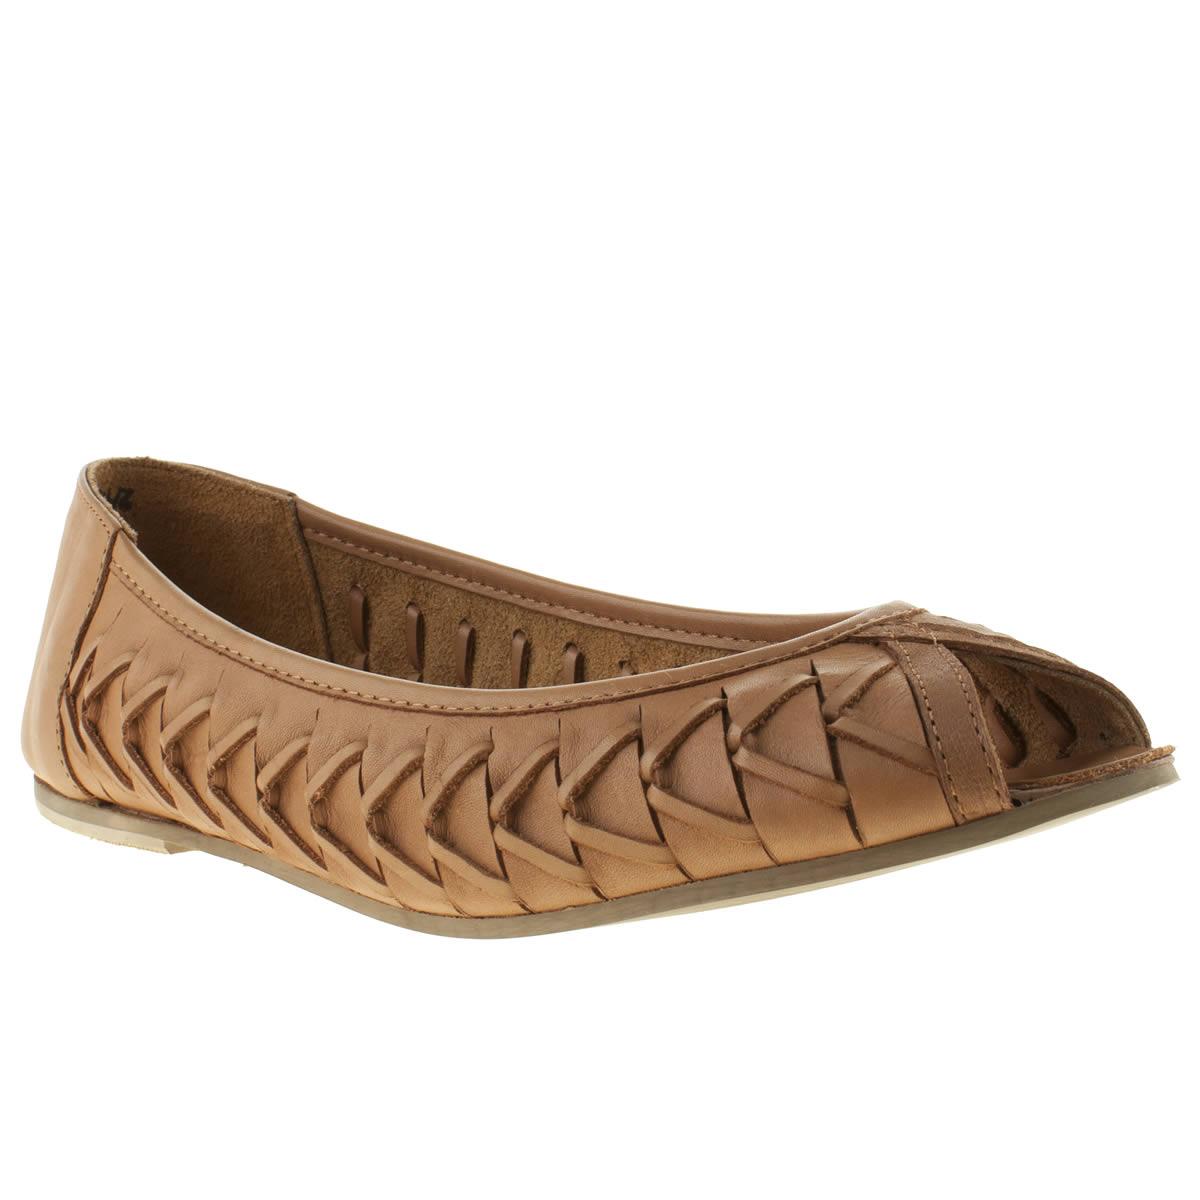 crew clothes shoes amp accessories for women men amp kids   hd